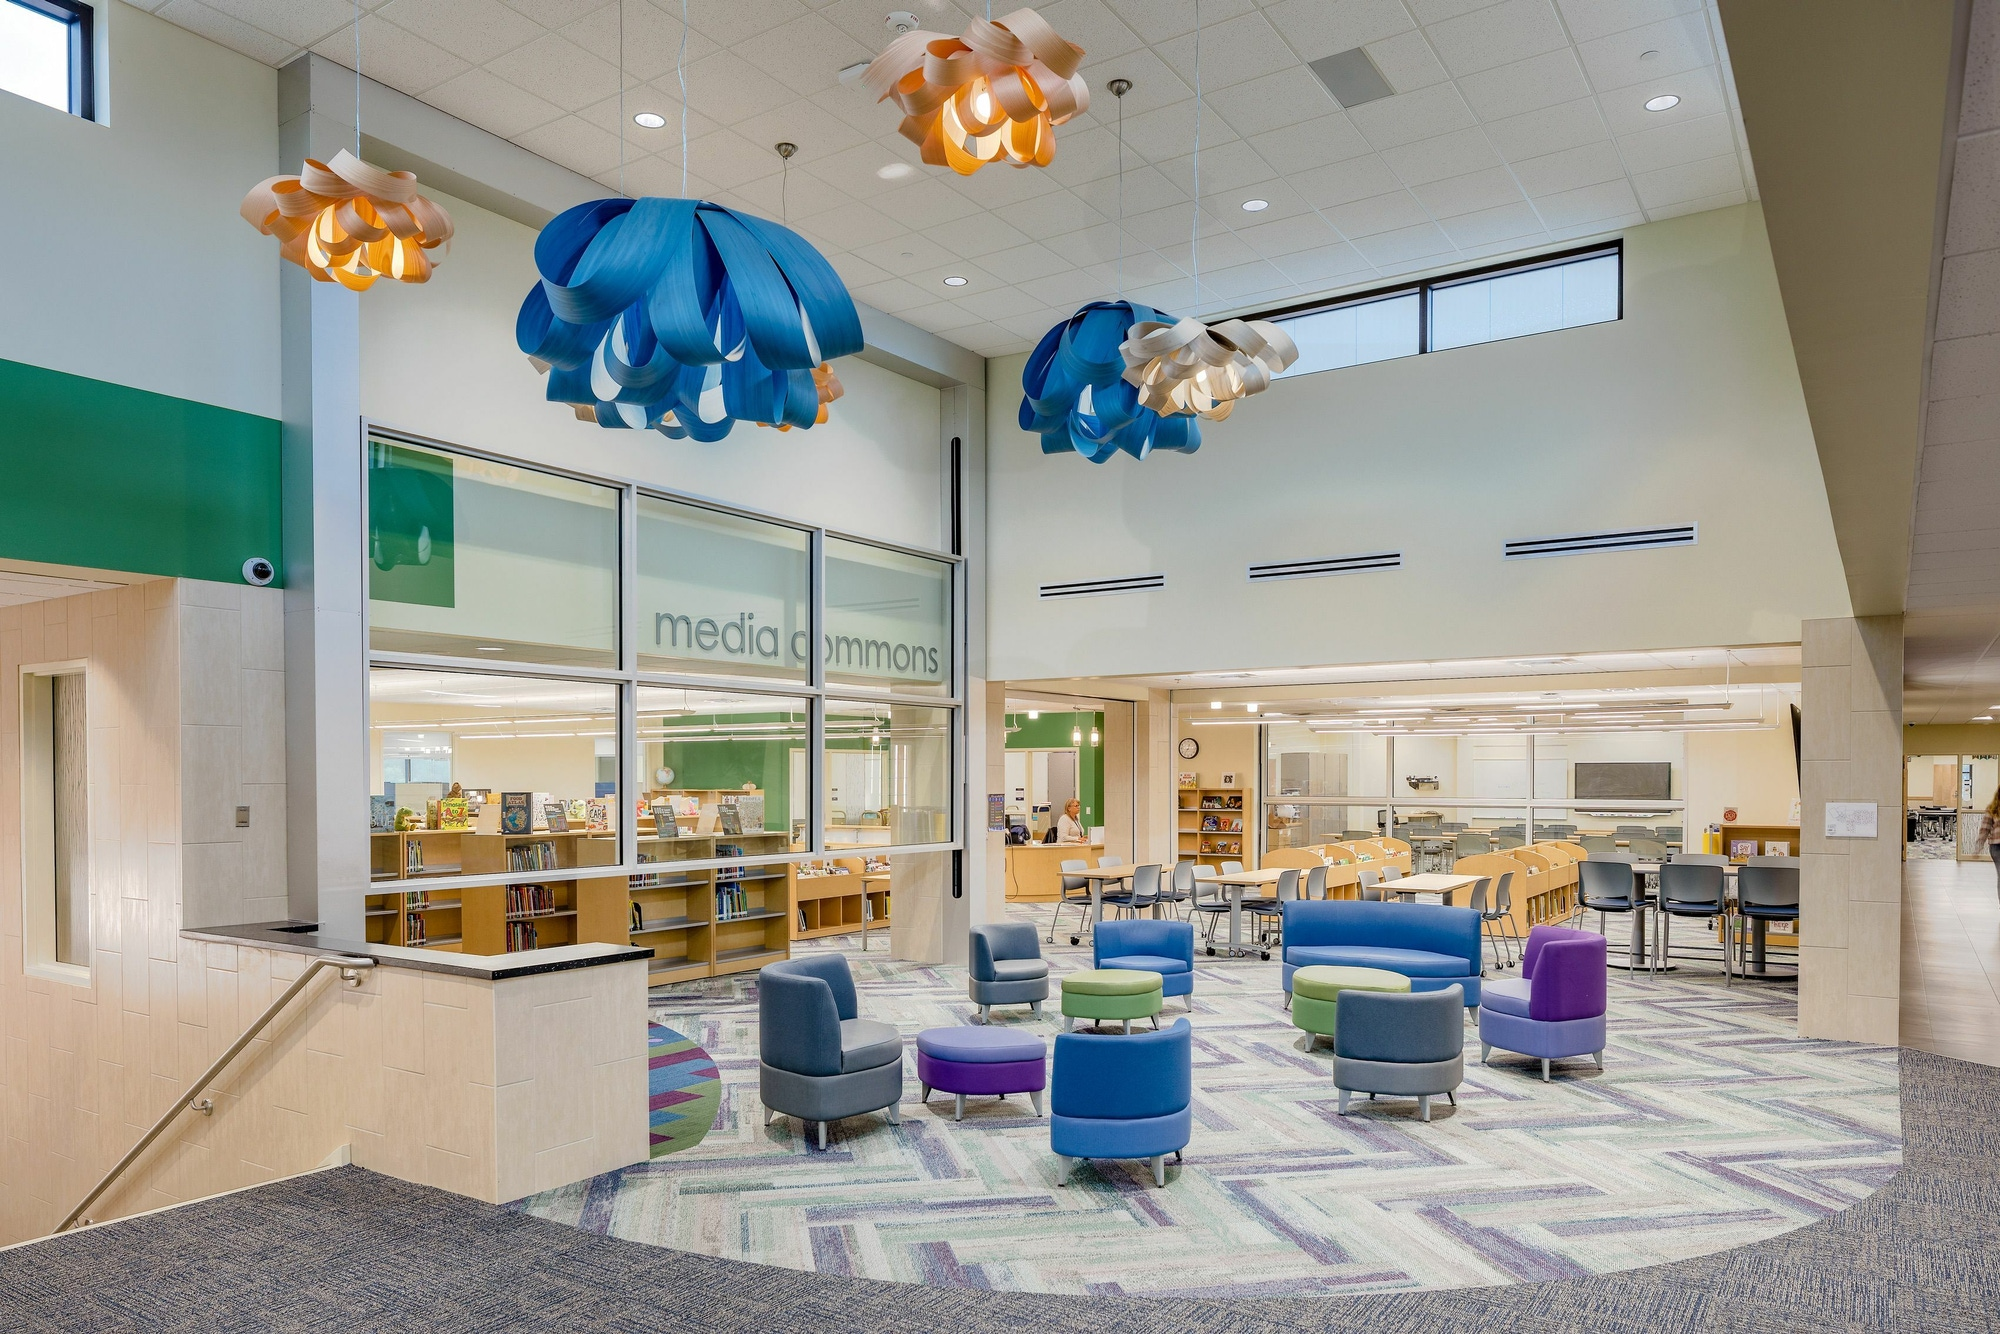 Architectural and Interior Design Services 4